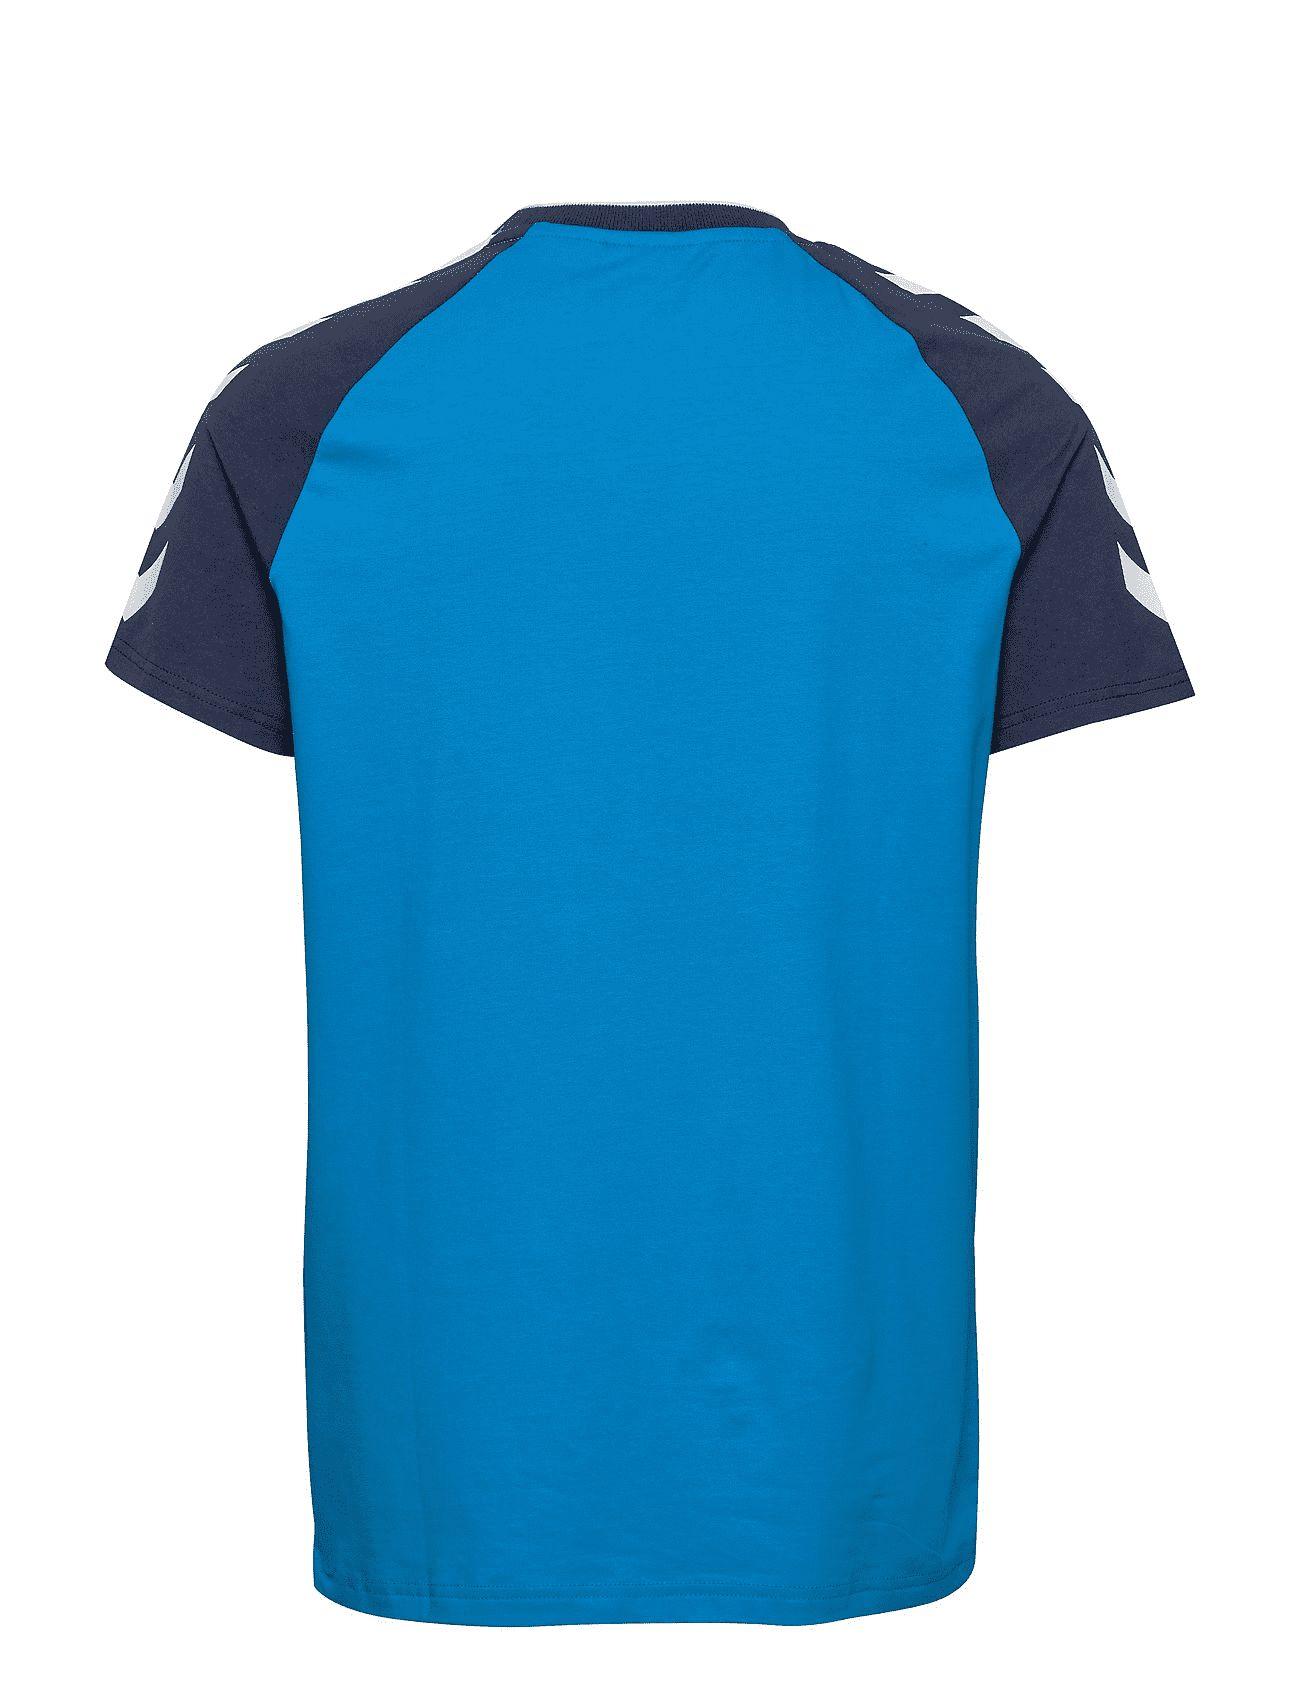 Hummel Mark t-shirt, blue easter, xx-large